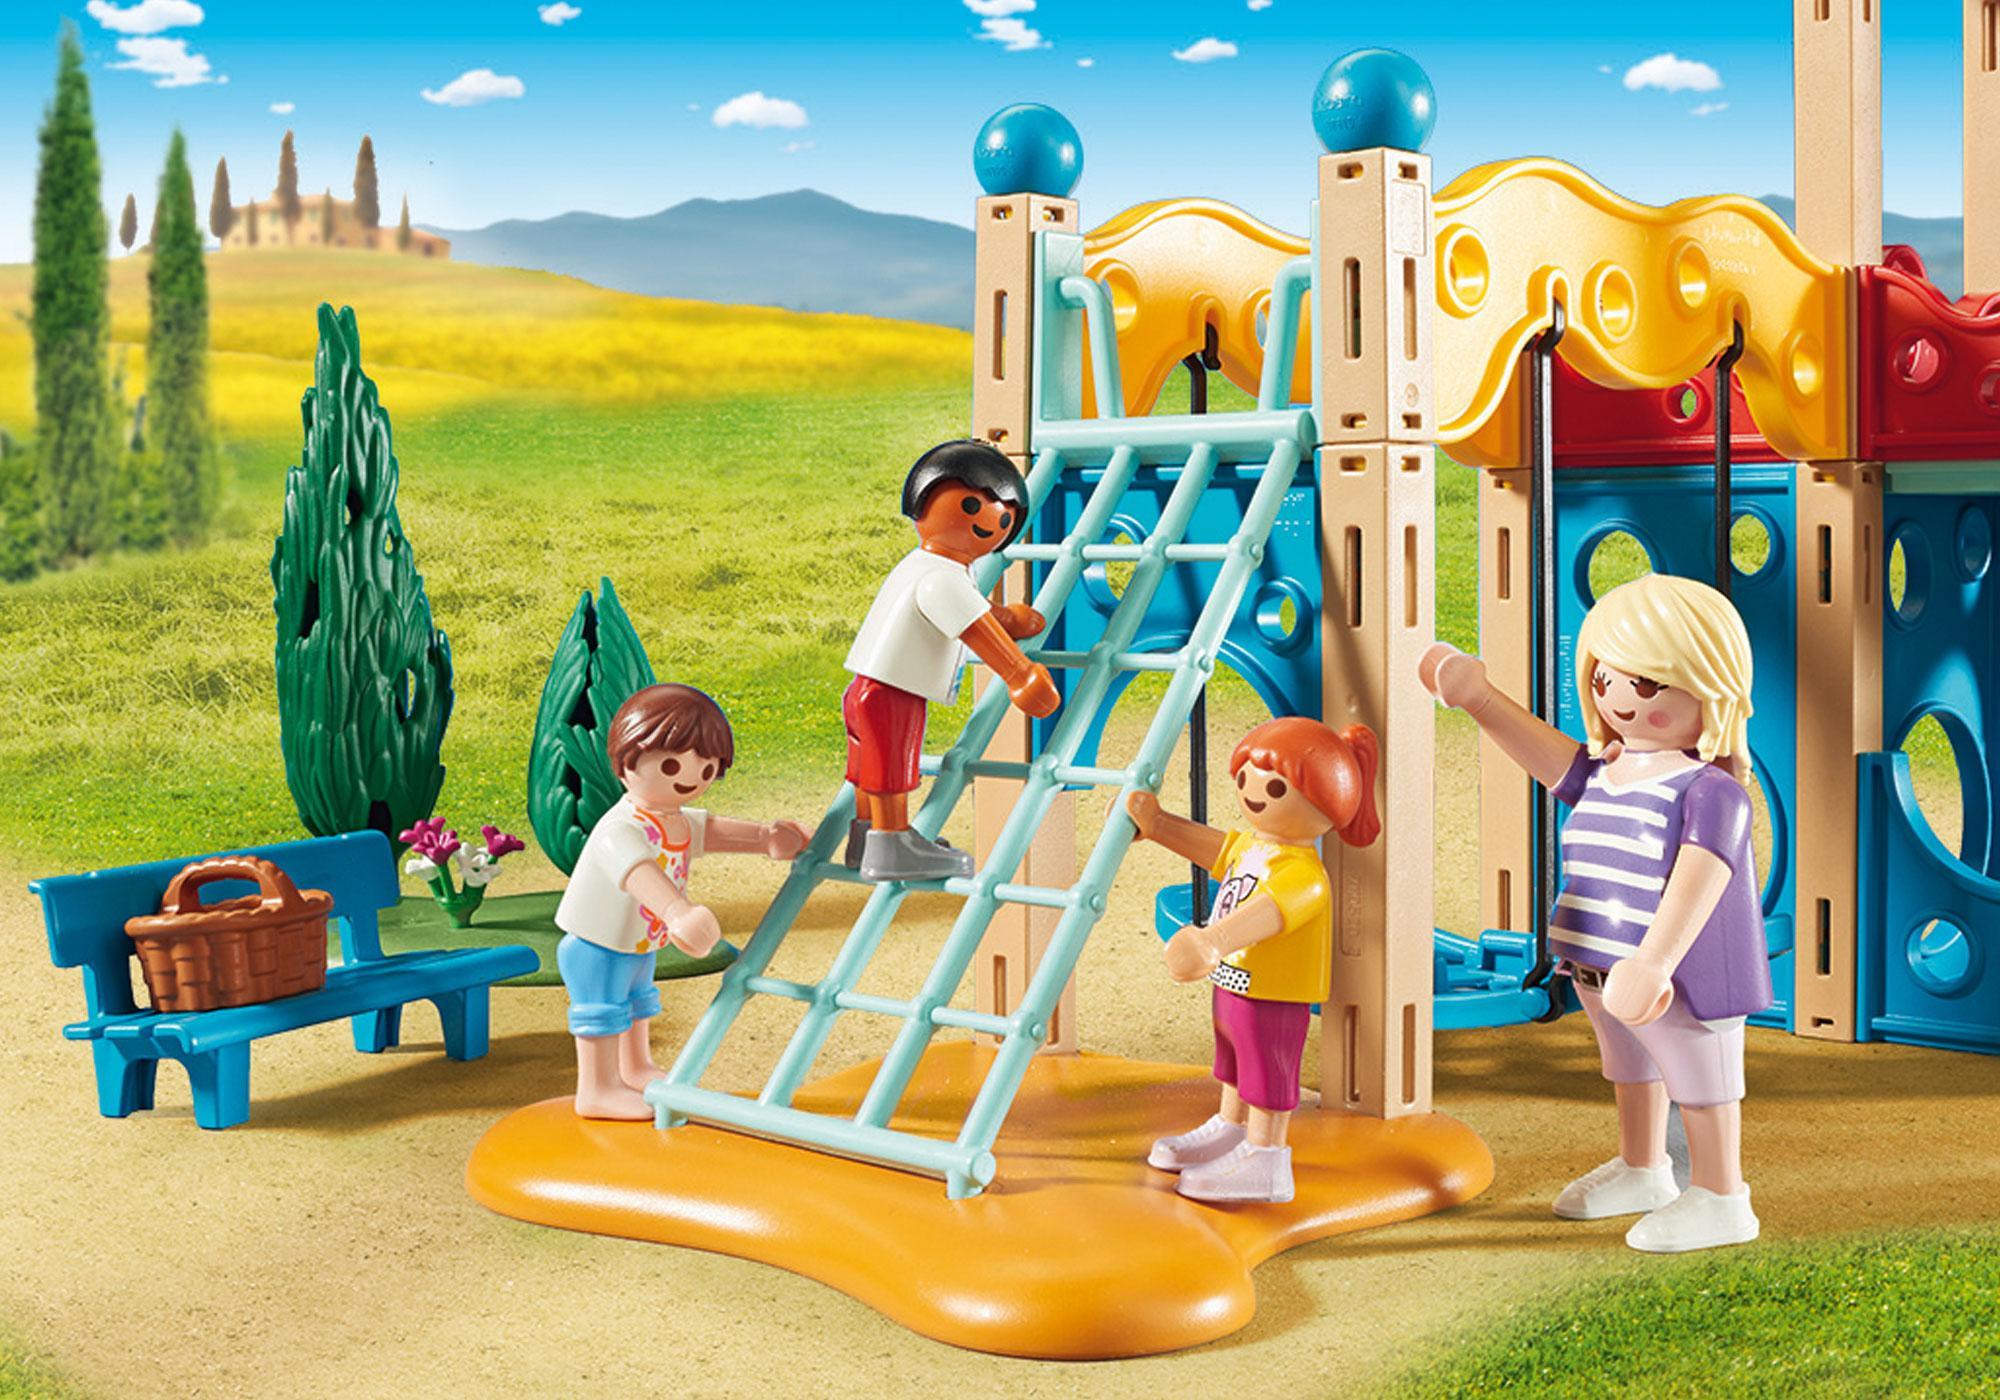 http://media.playmobil.com/i/playmobil/9423_product_extra1/Grote speeltuin